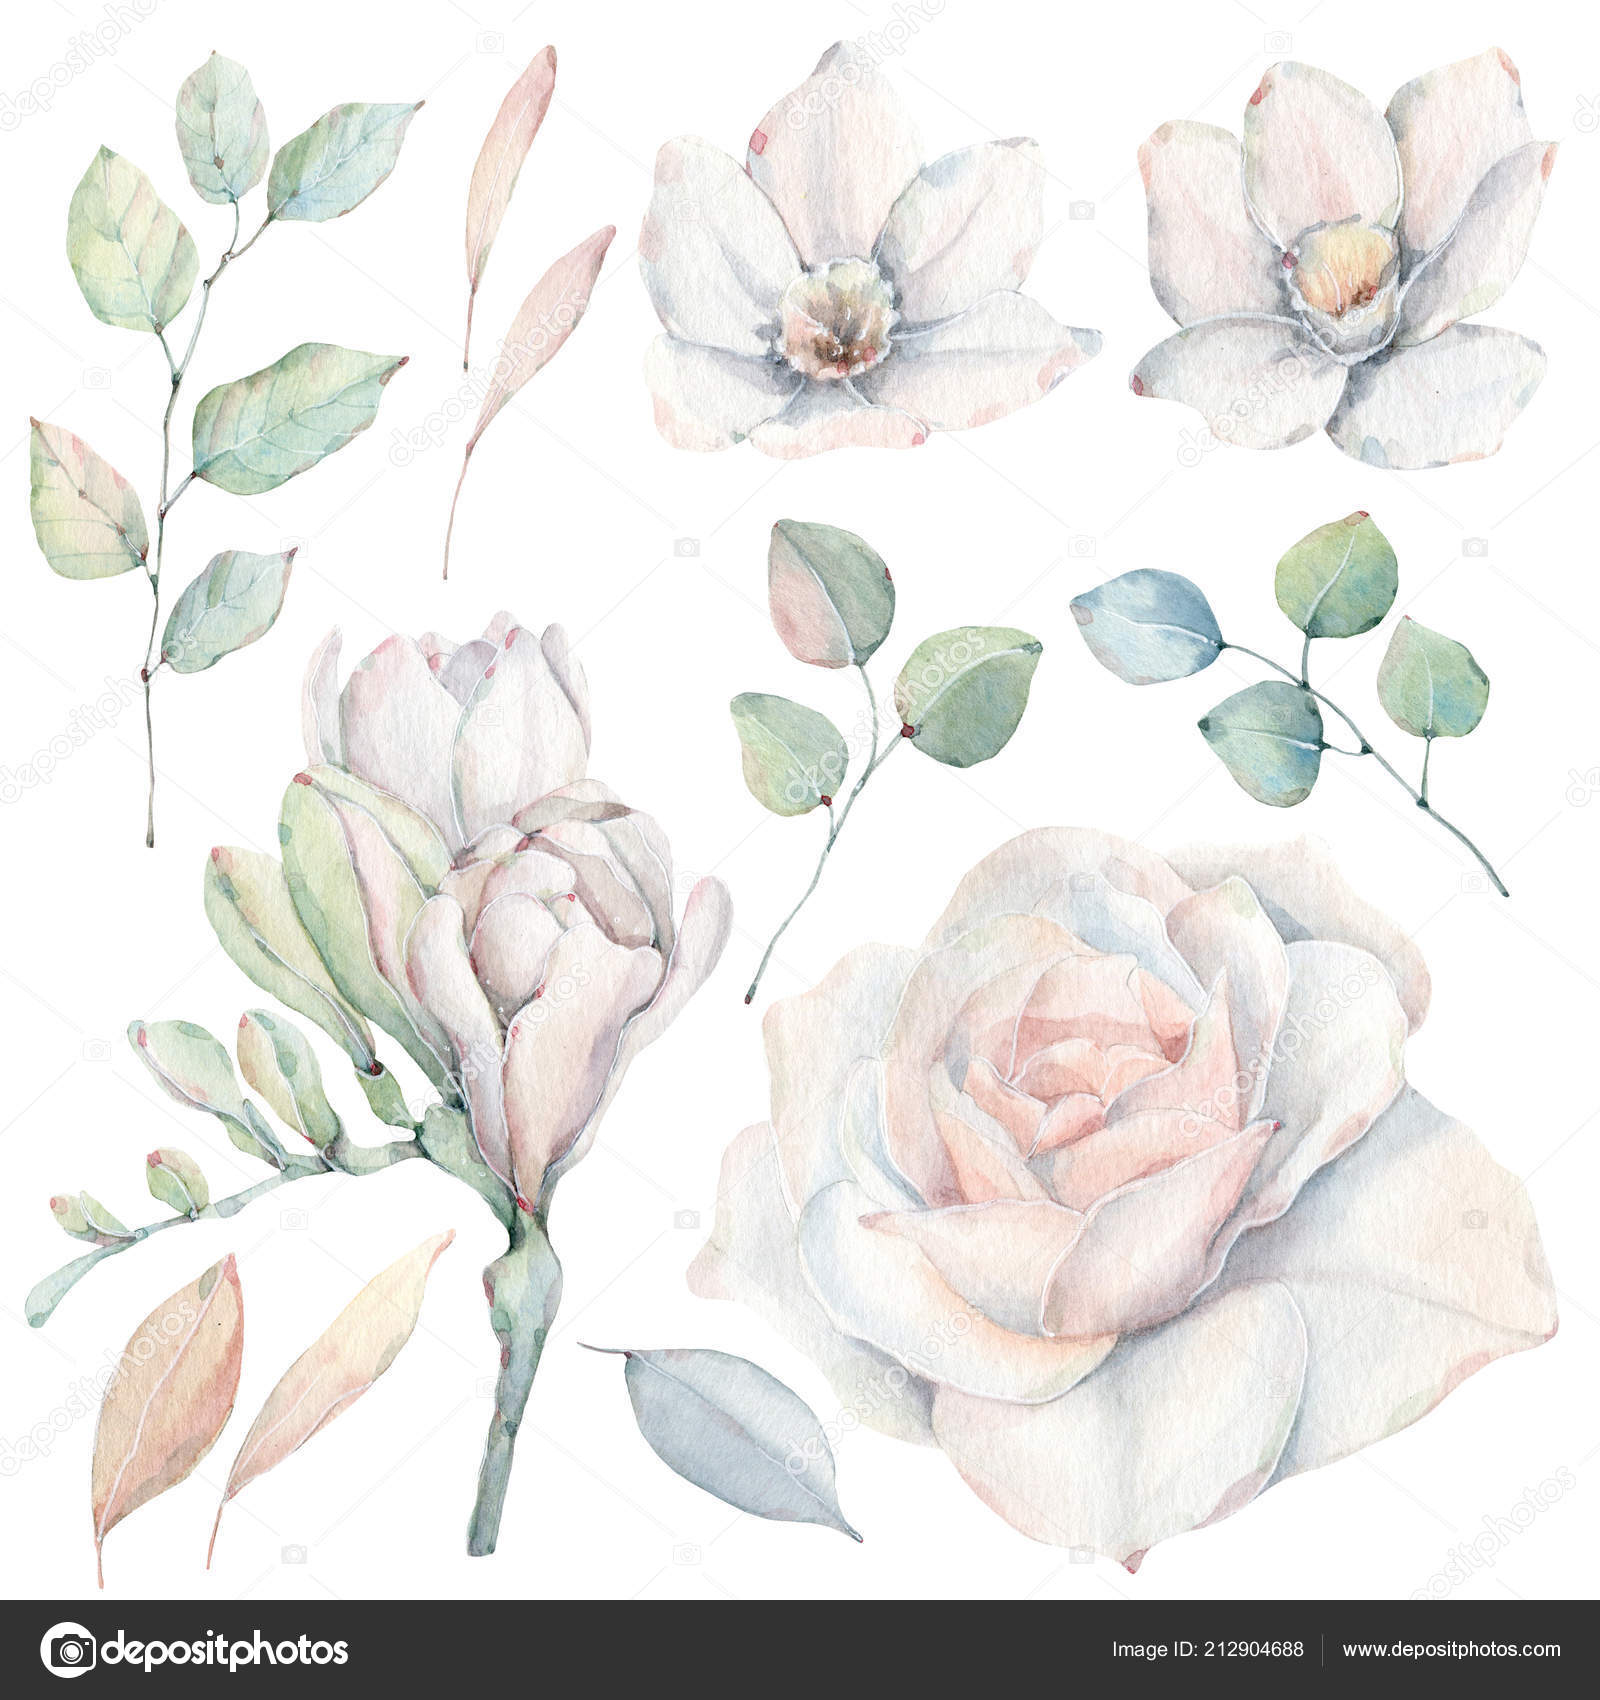 Handbemalt Aquarelle Blumen Set Vintage Stil Ist Ideal Fur